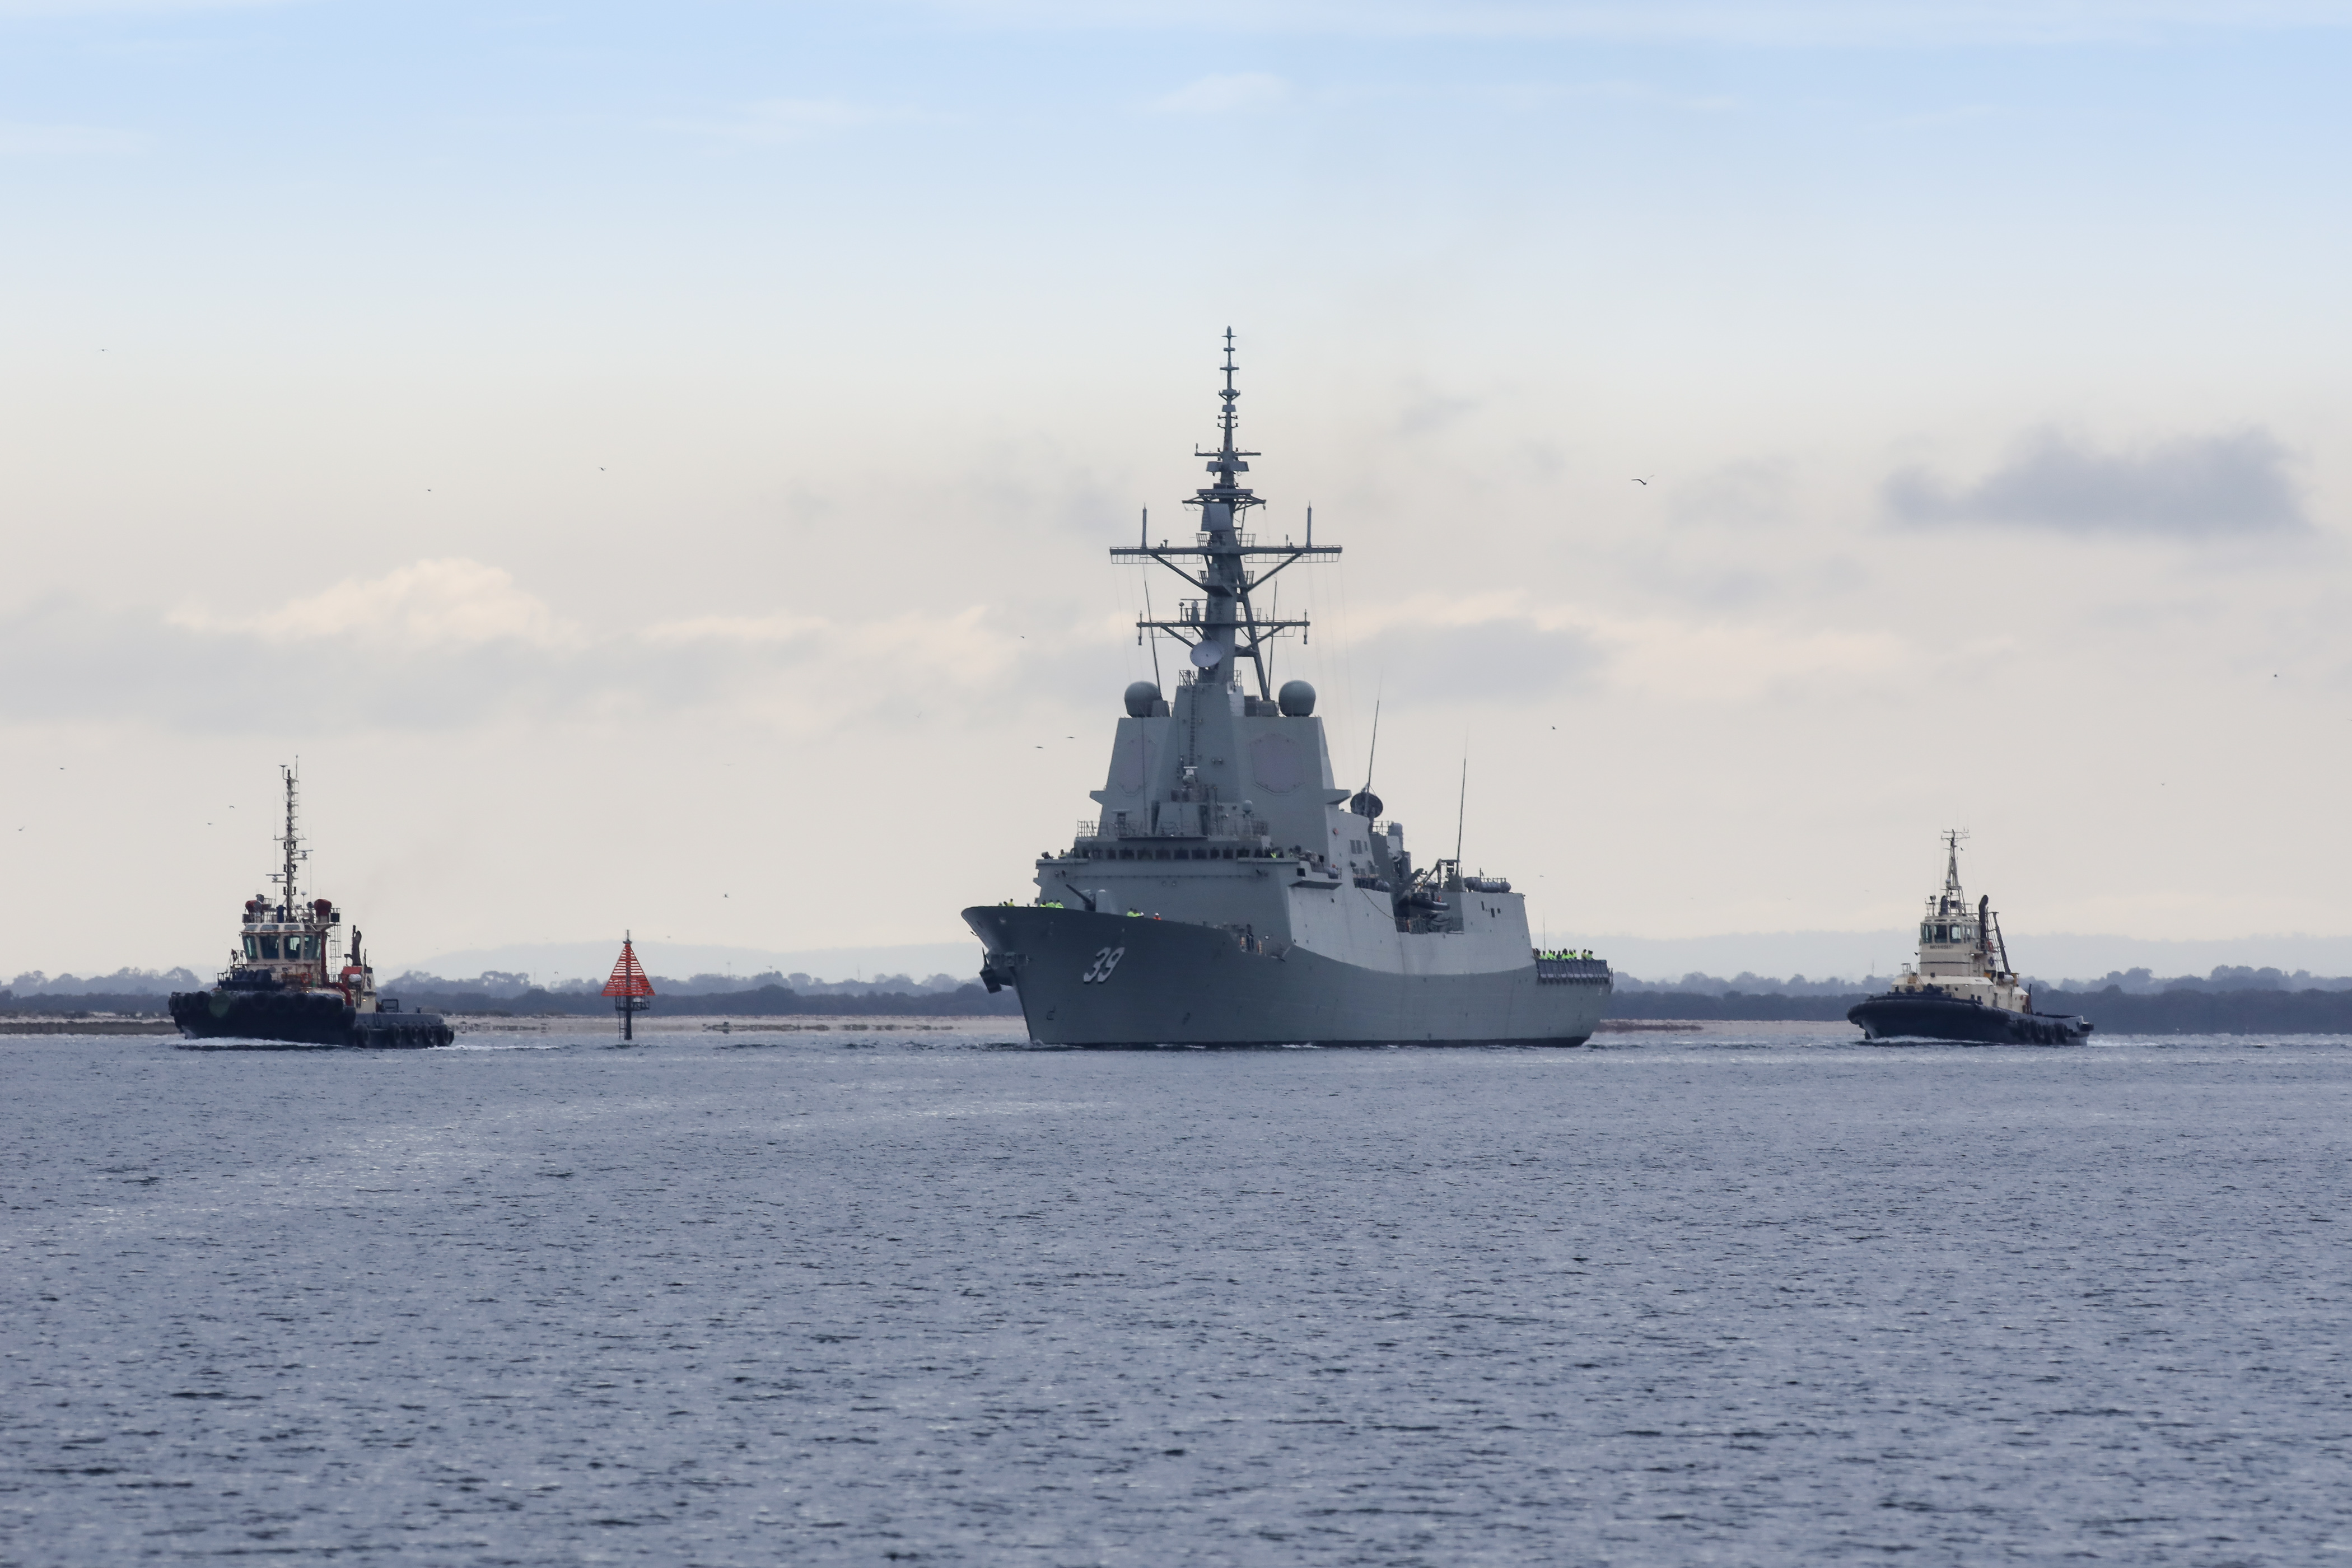 'Hobart' class destroyer HMAS Hobart